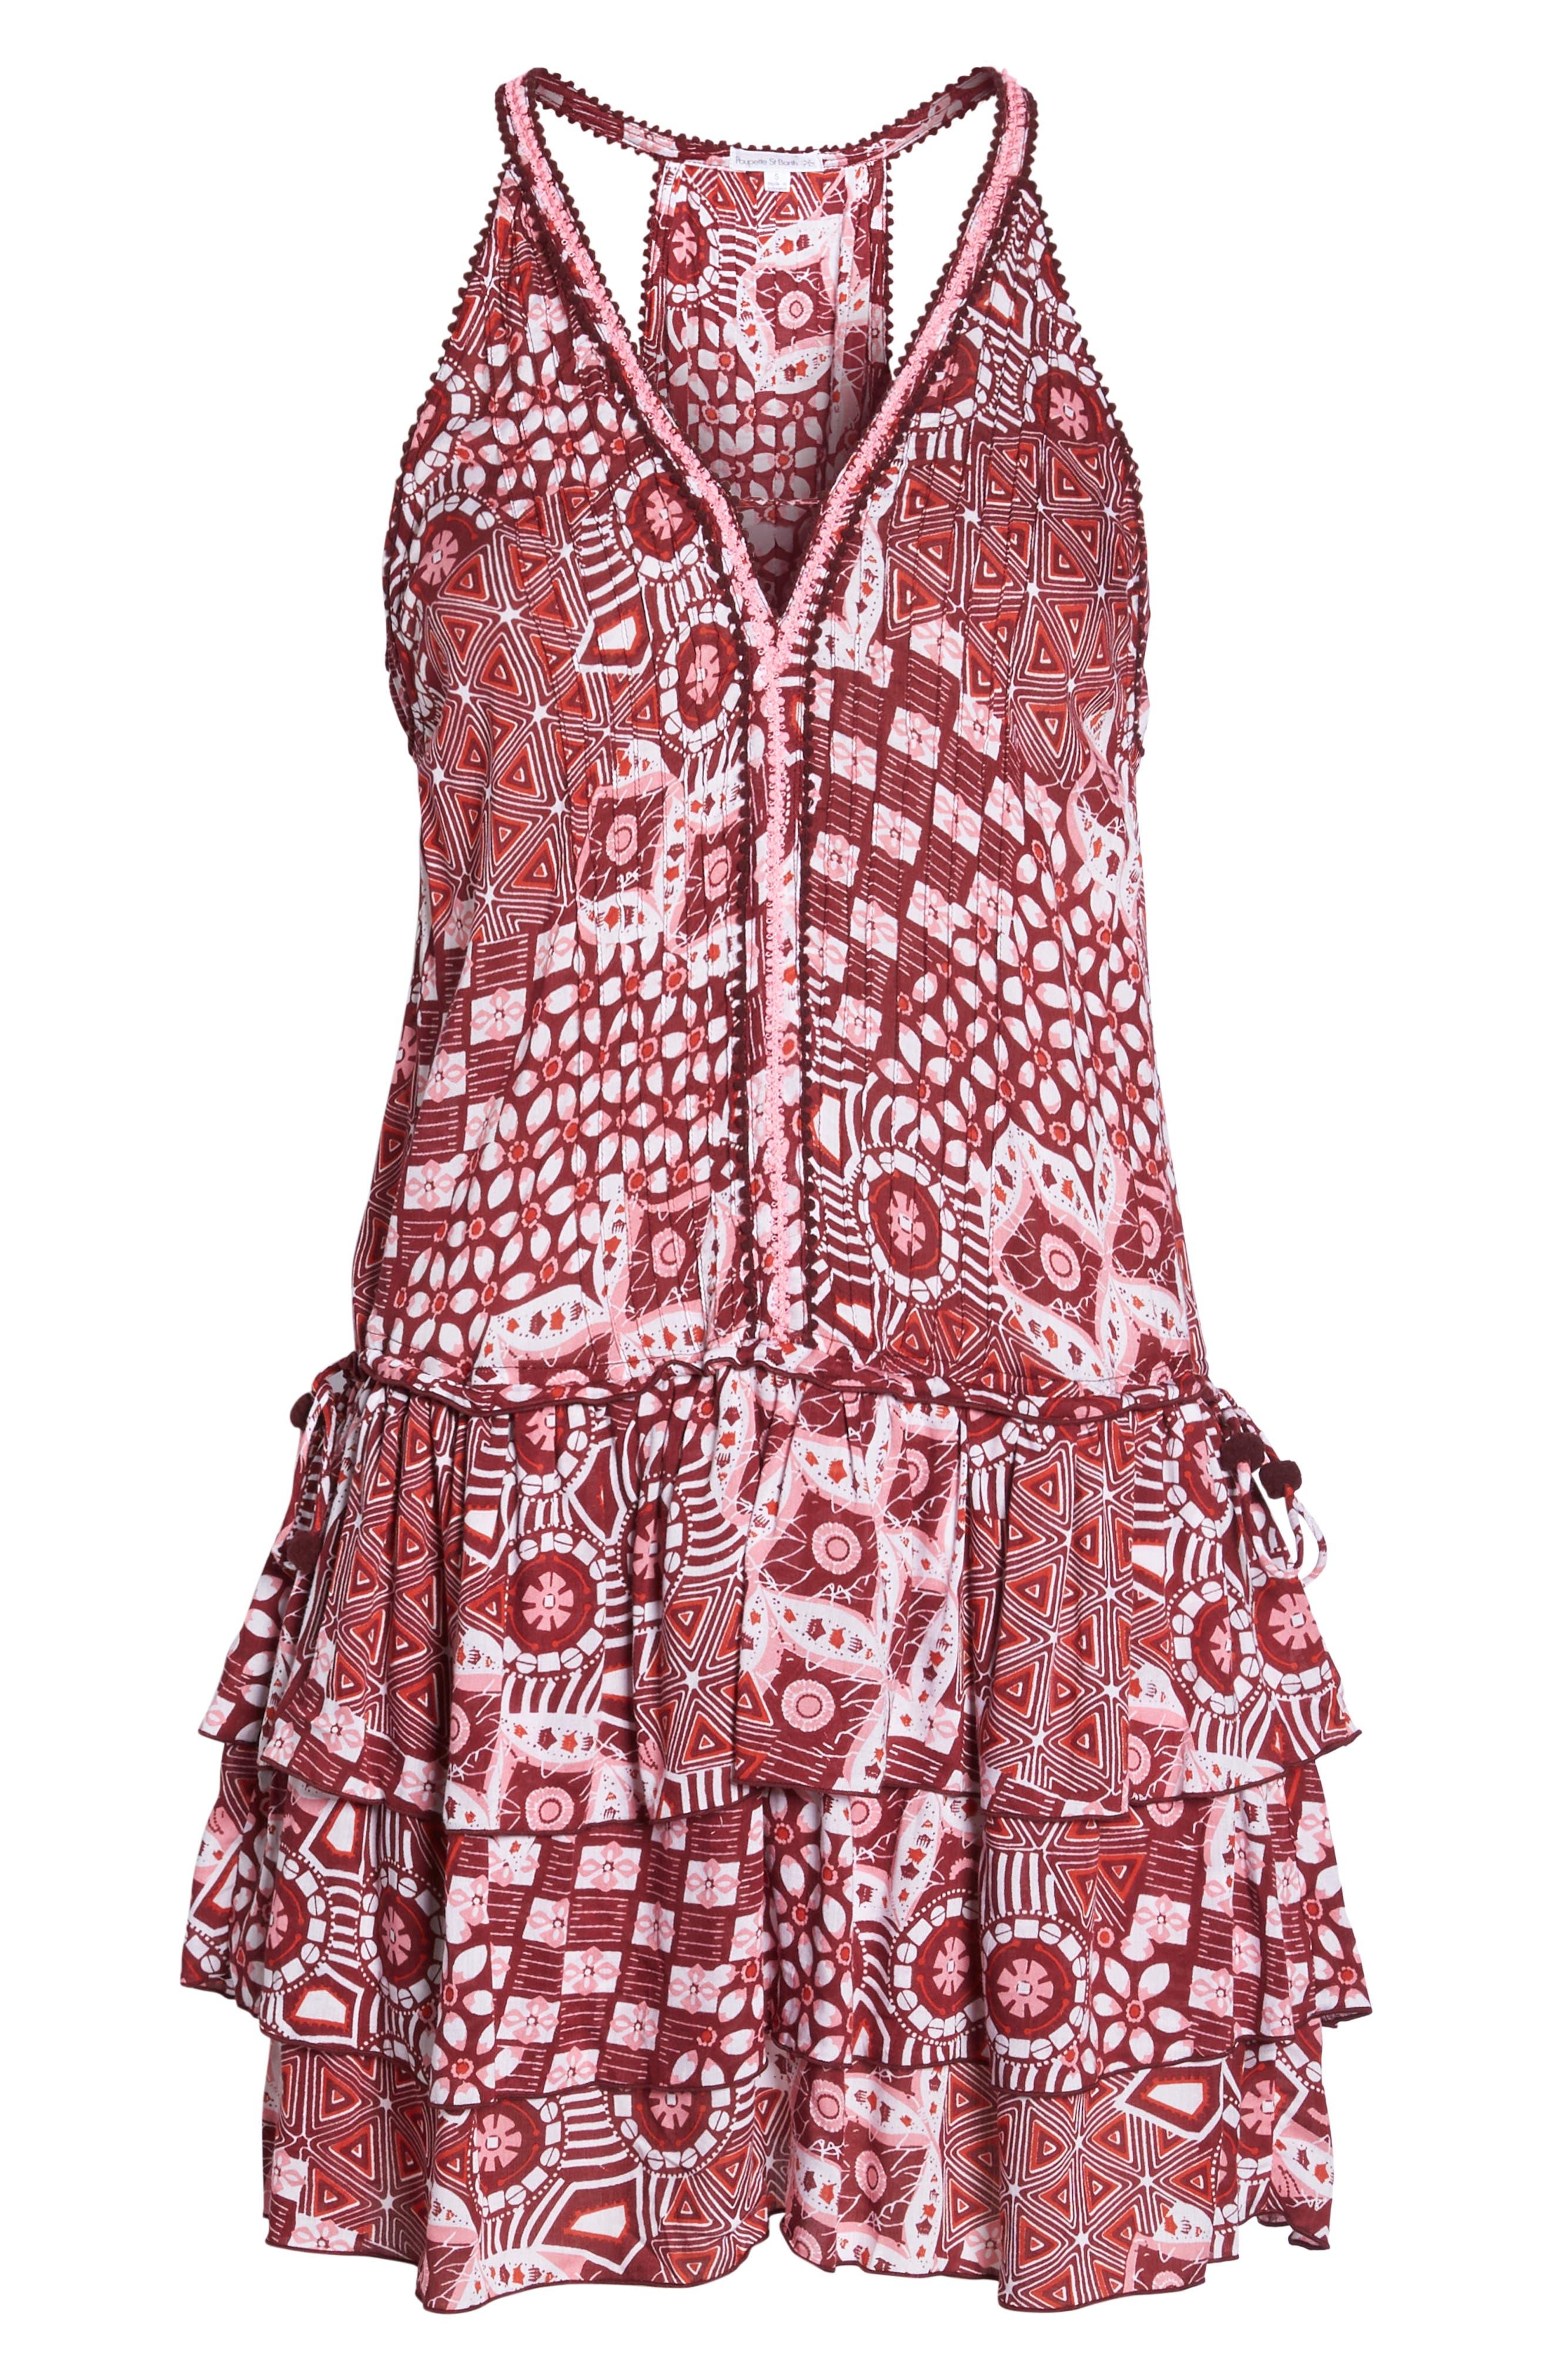 Poupette St. Barth Bety Cover-Up Minidress,                             Alternate thumbnail 6, color,                             Pink Mali